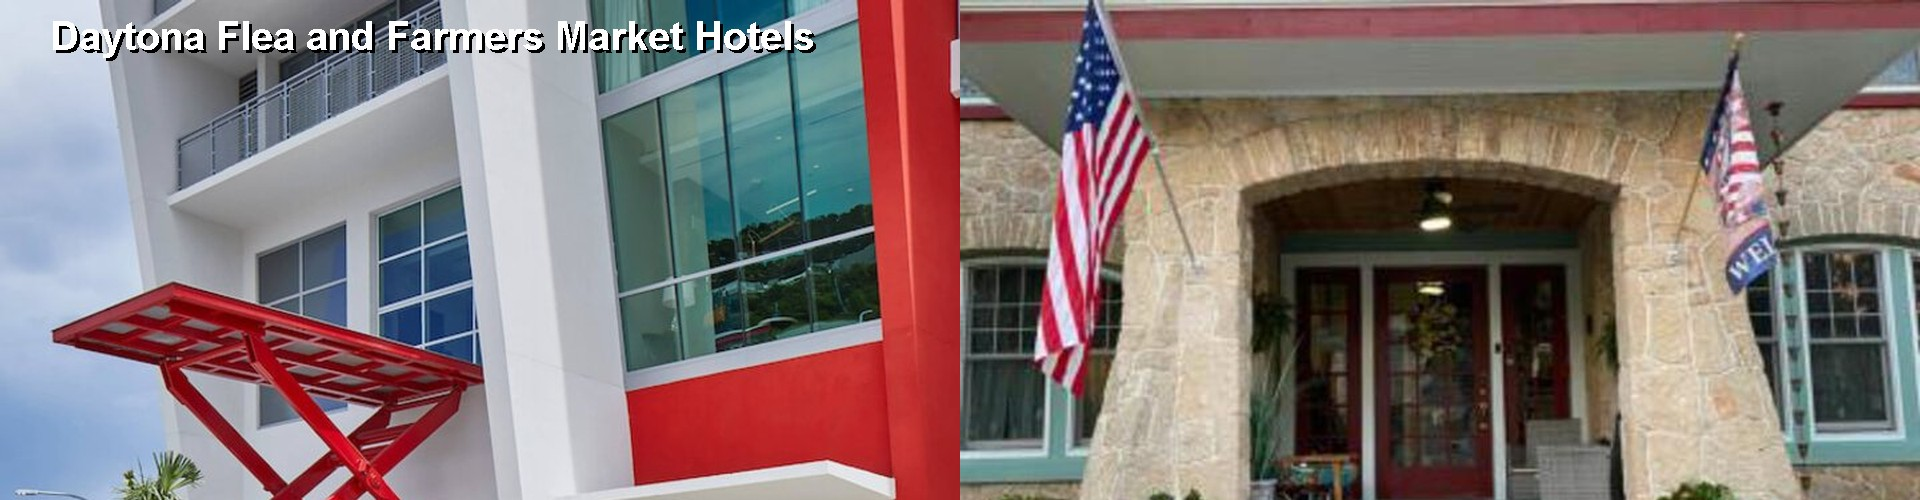 Hotels Near Daytona Beach Flea Market